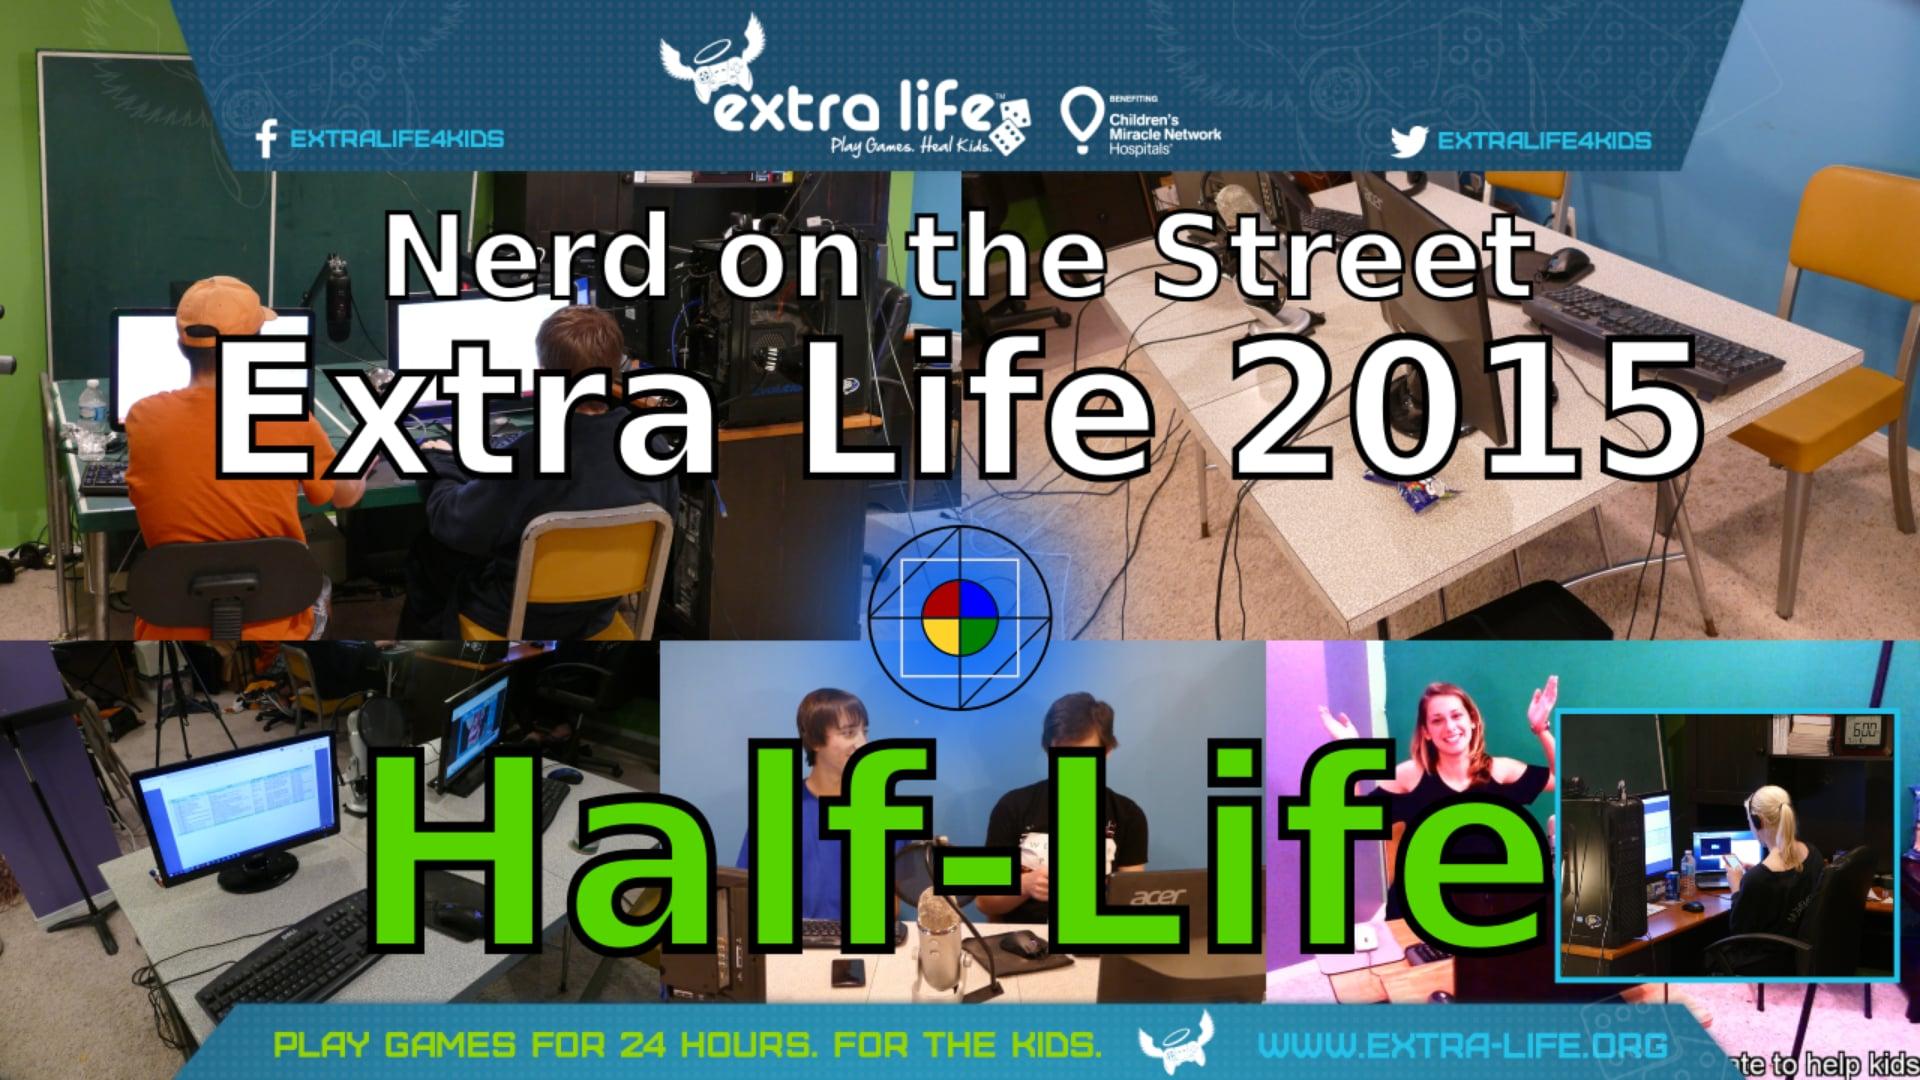 Half-Life - Extra Life 2015